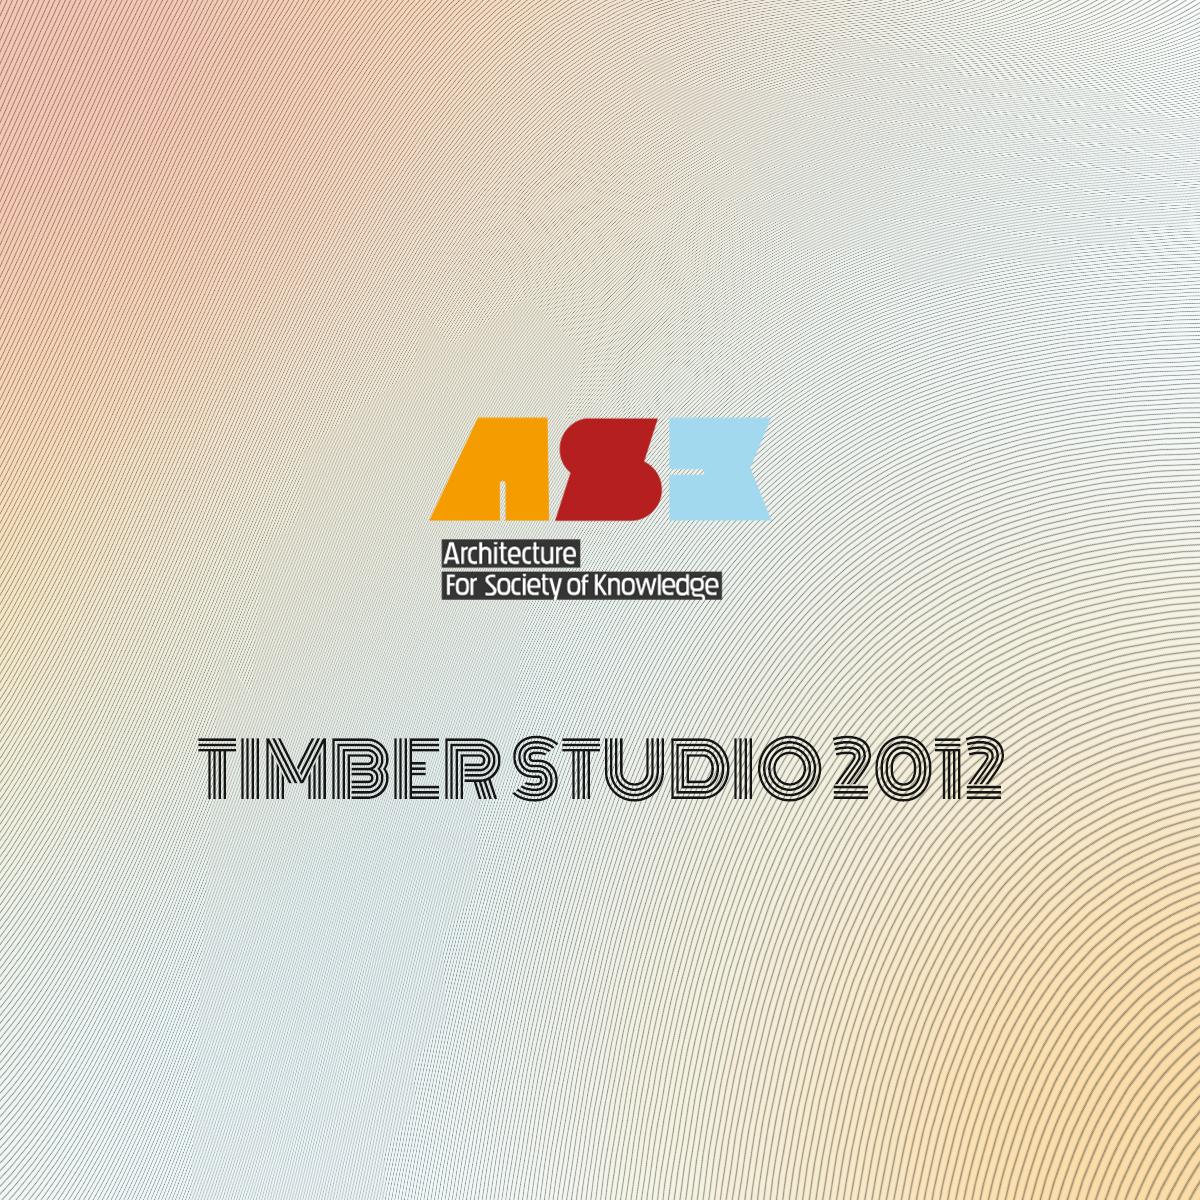 Timber Studio 2012